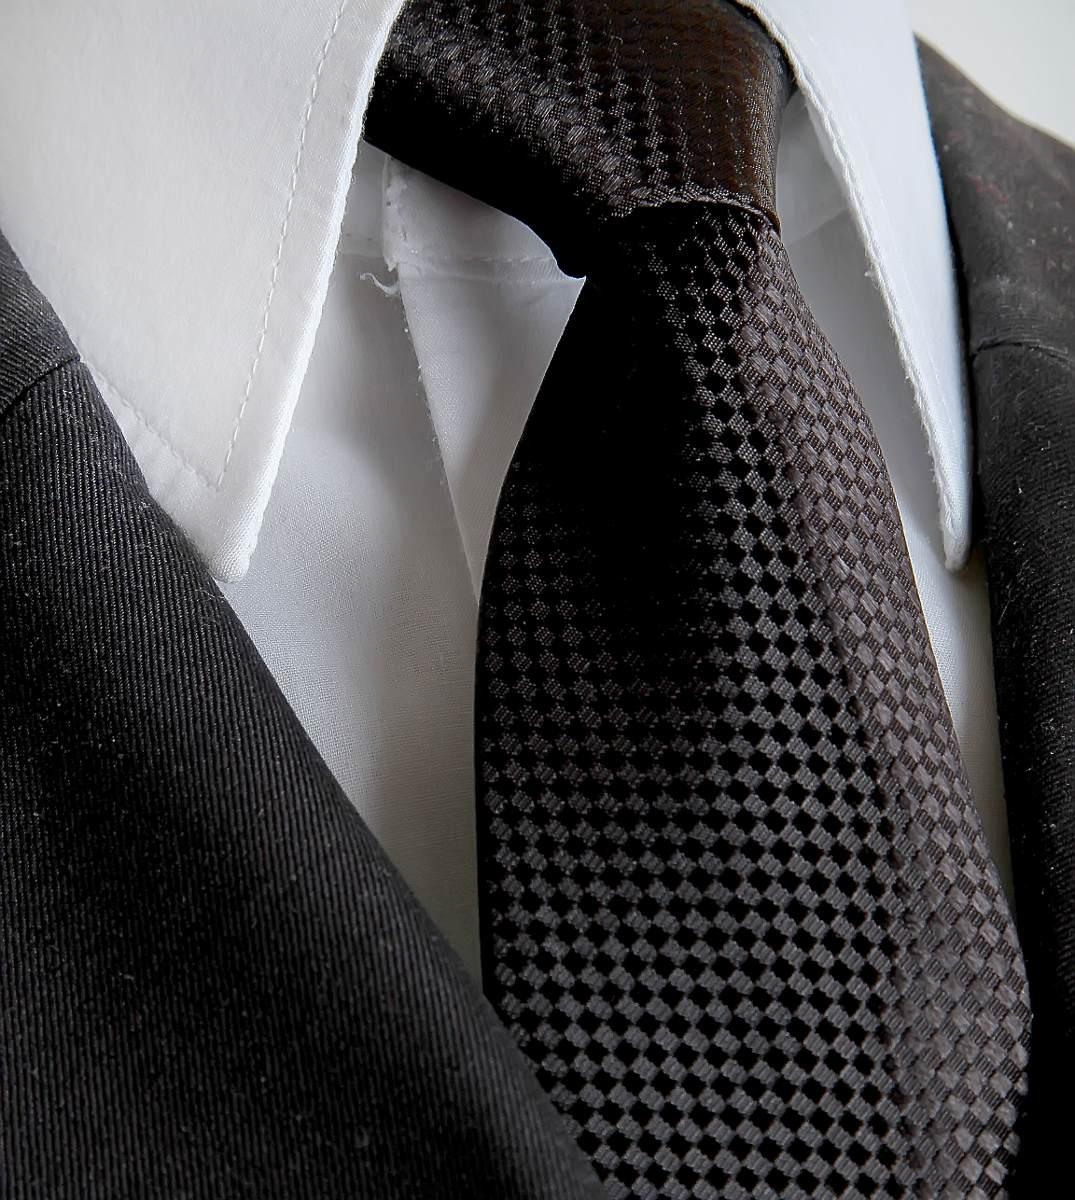 d9336016257 gravata social preta semi slim - formatura  casamento. Carregando zoom.